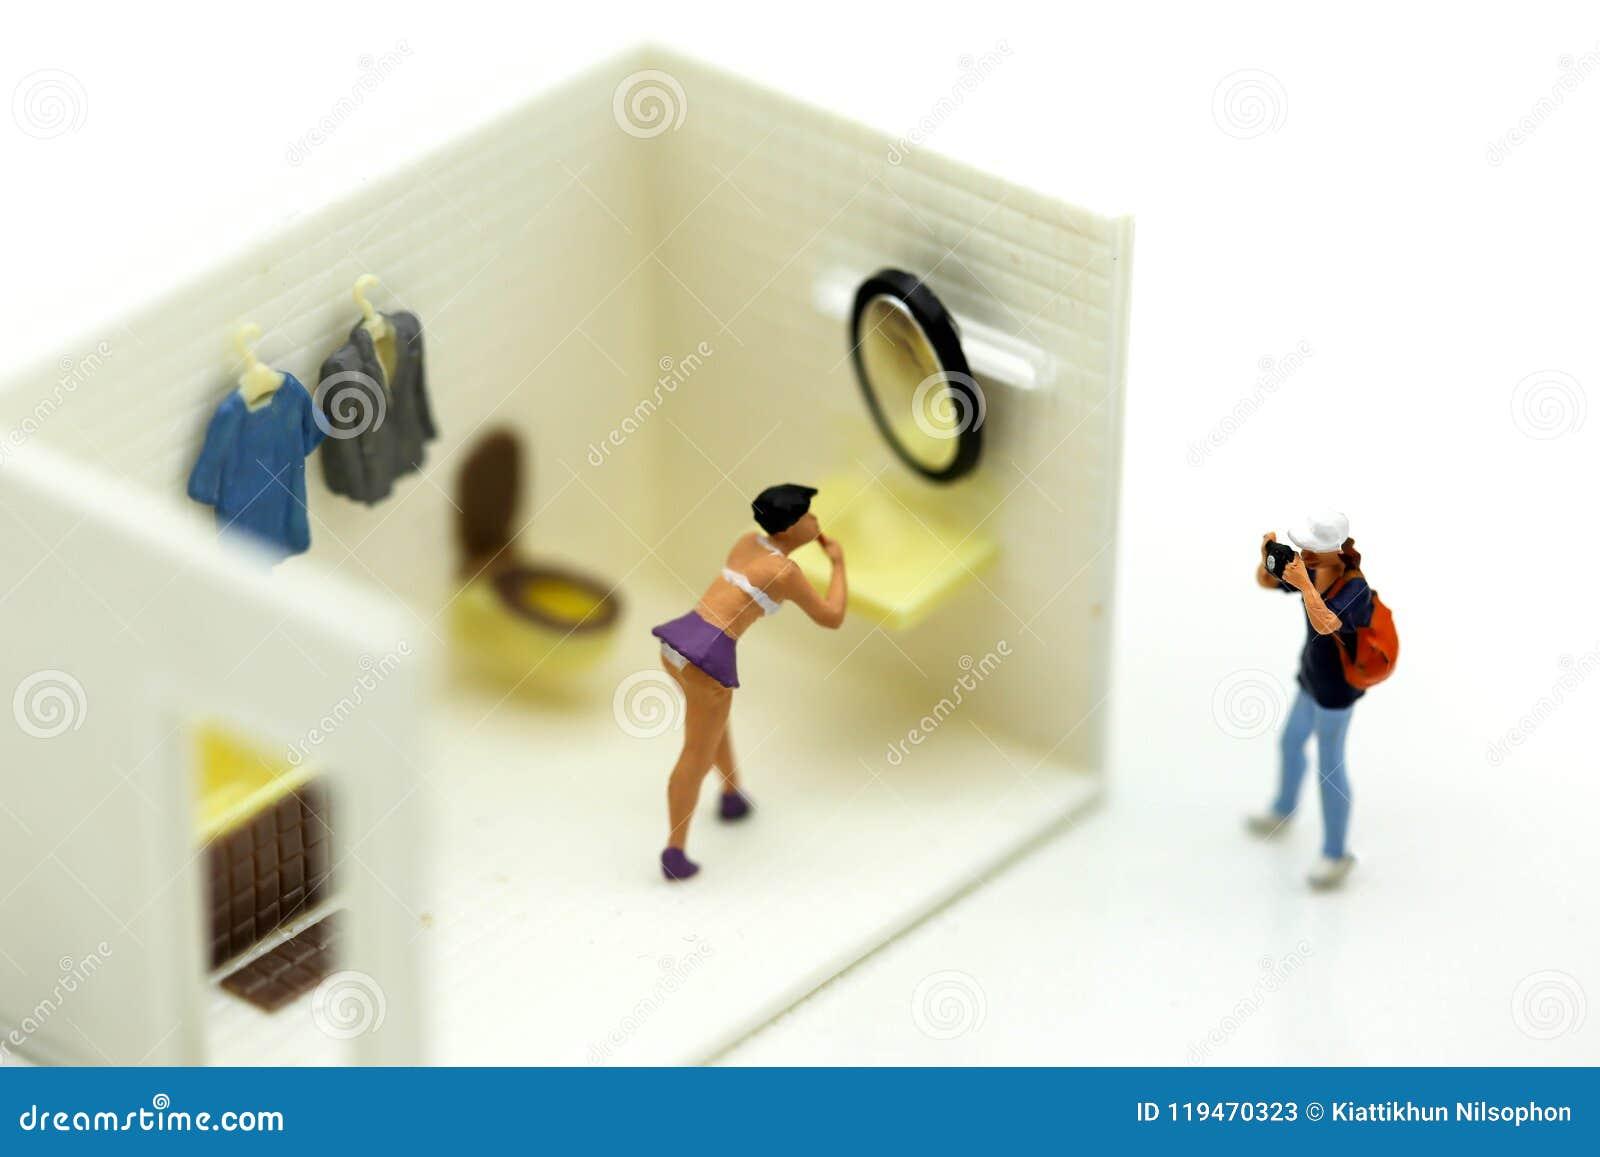 Apologise, but Women bathroom voyeur here